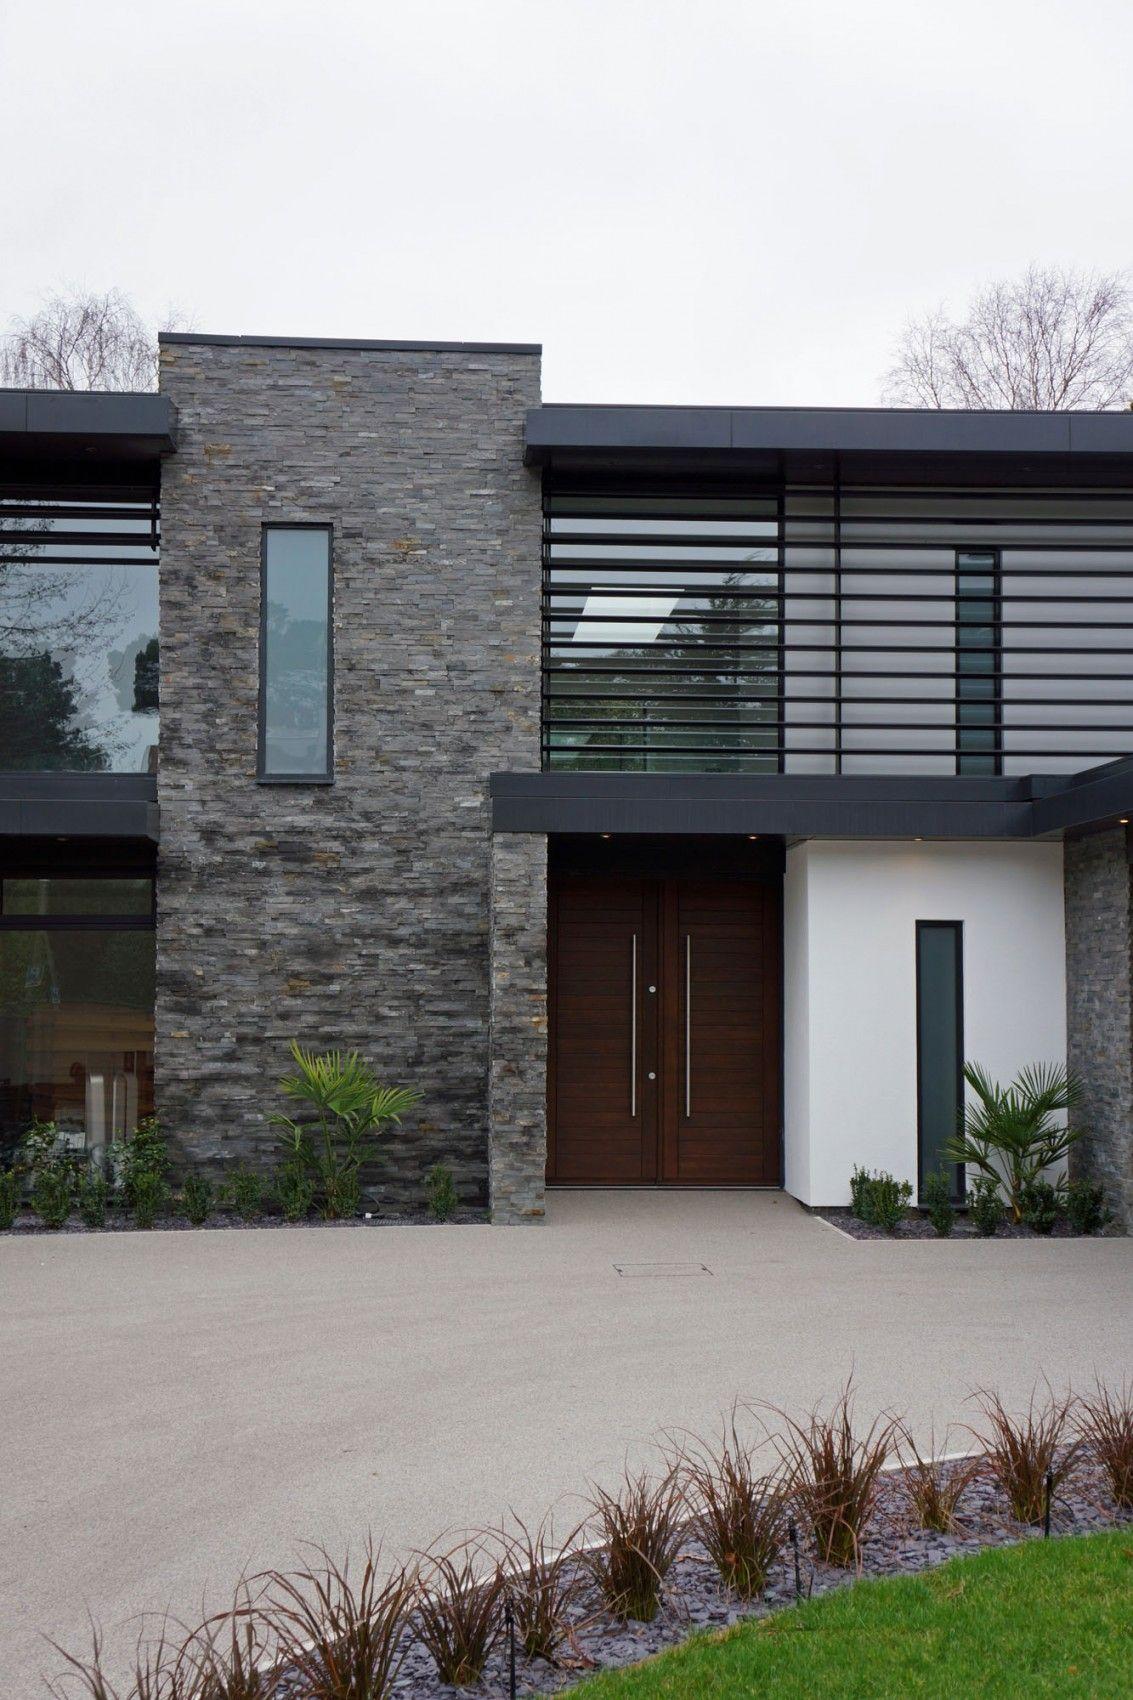 Nairn road residence by david james architects david james and